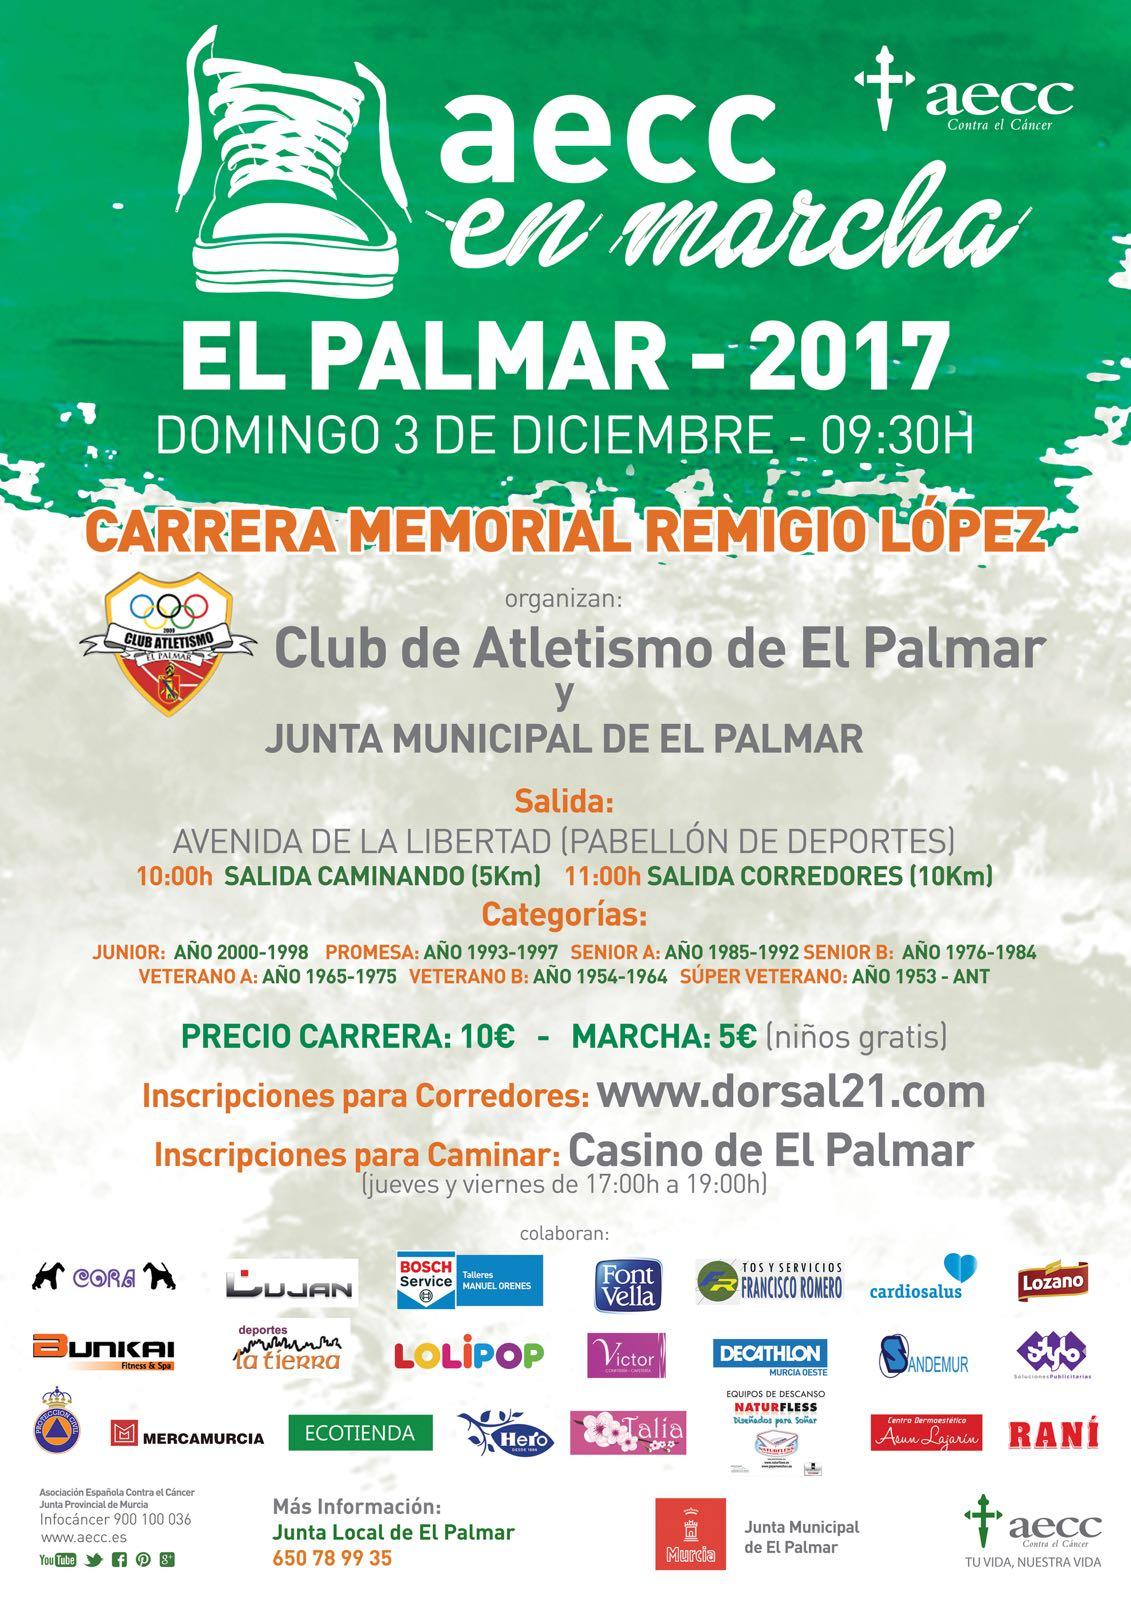 Naturfless en la AECC en marcha El Palmar 2017